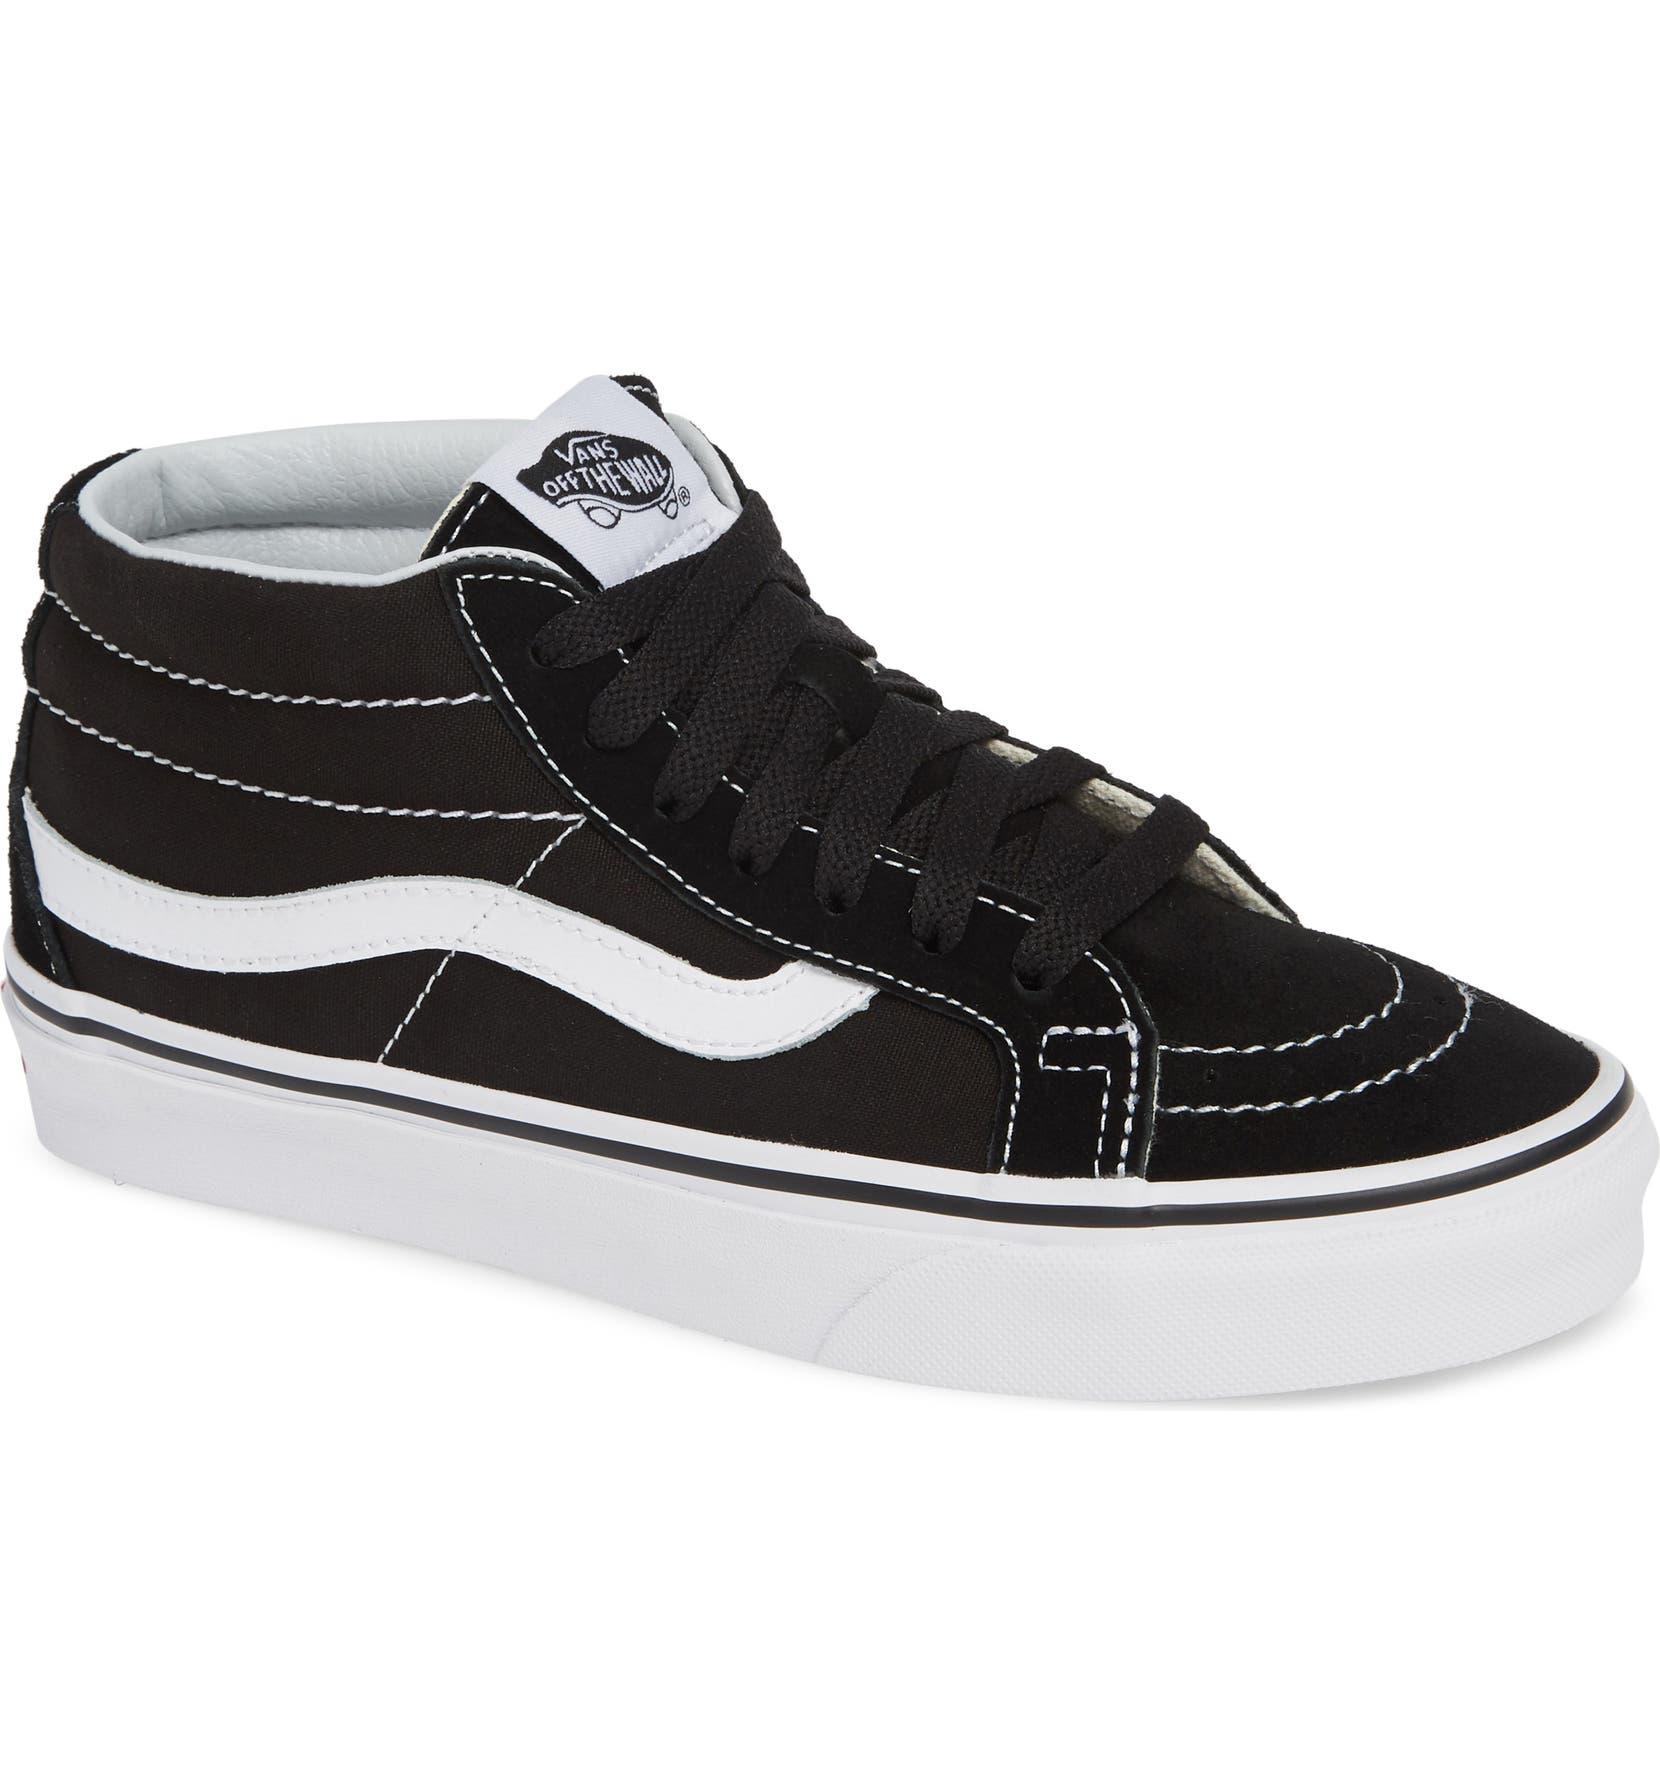 19e508a45cfb Vans Sk8 Mid Reissue Sneaker (Women)